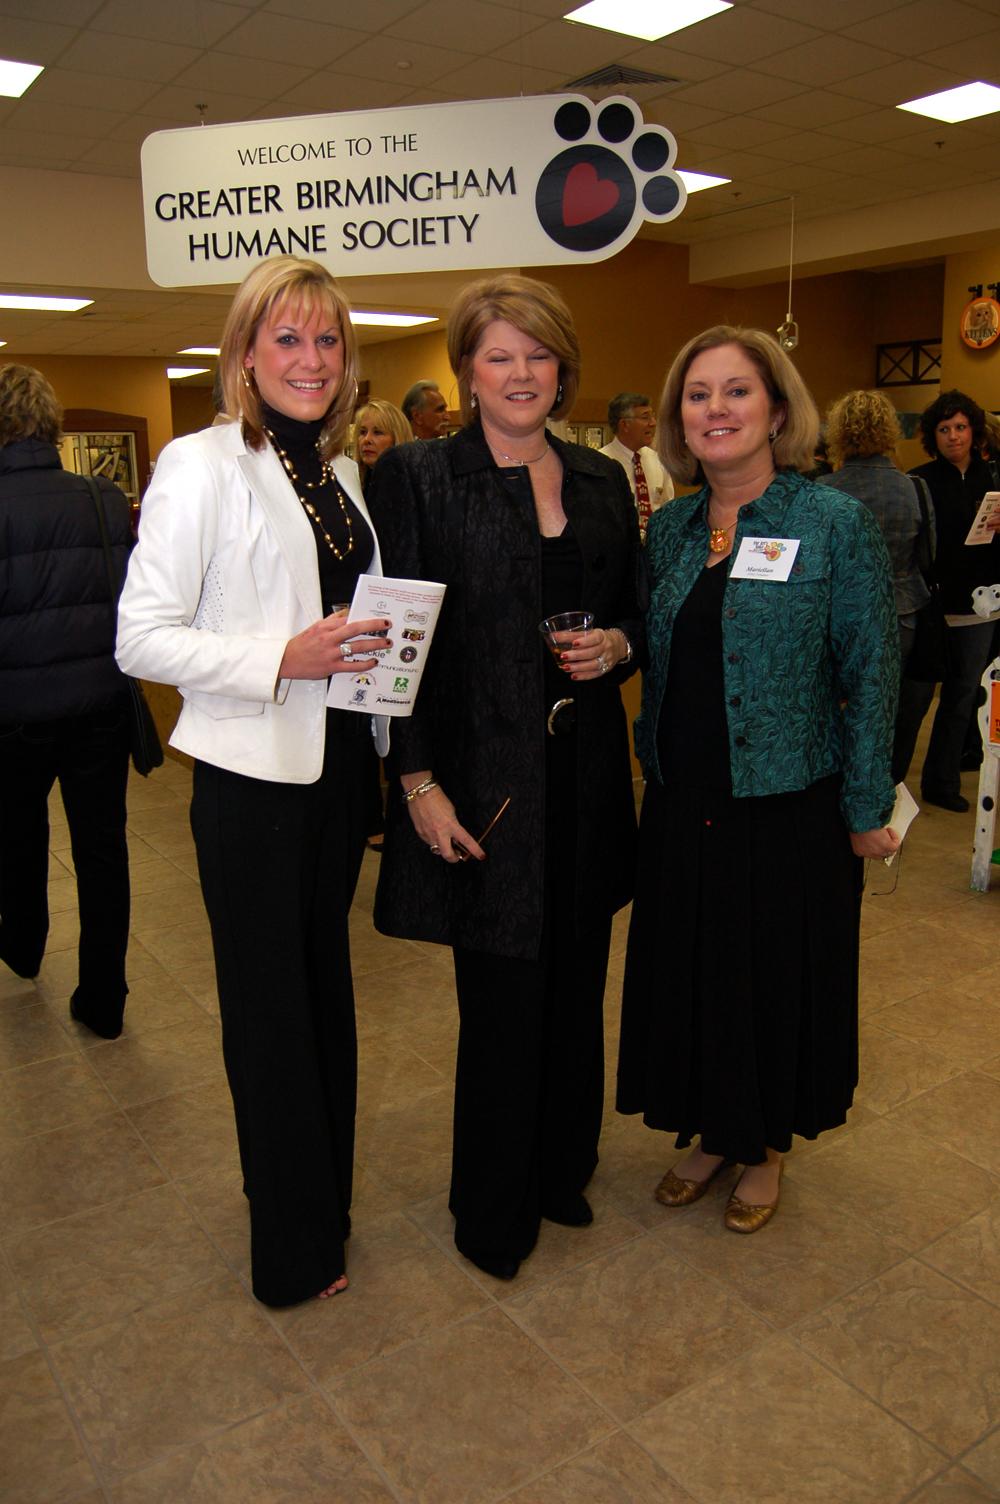 Katherine Mayer, Cheryl Mayer and Mariellan